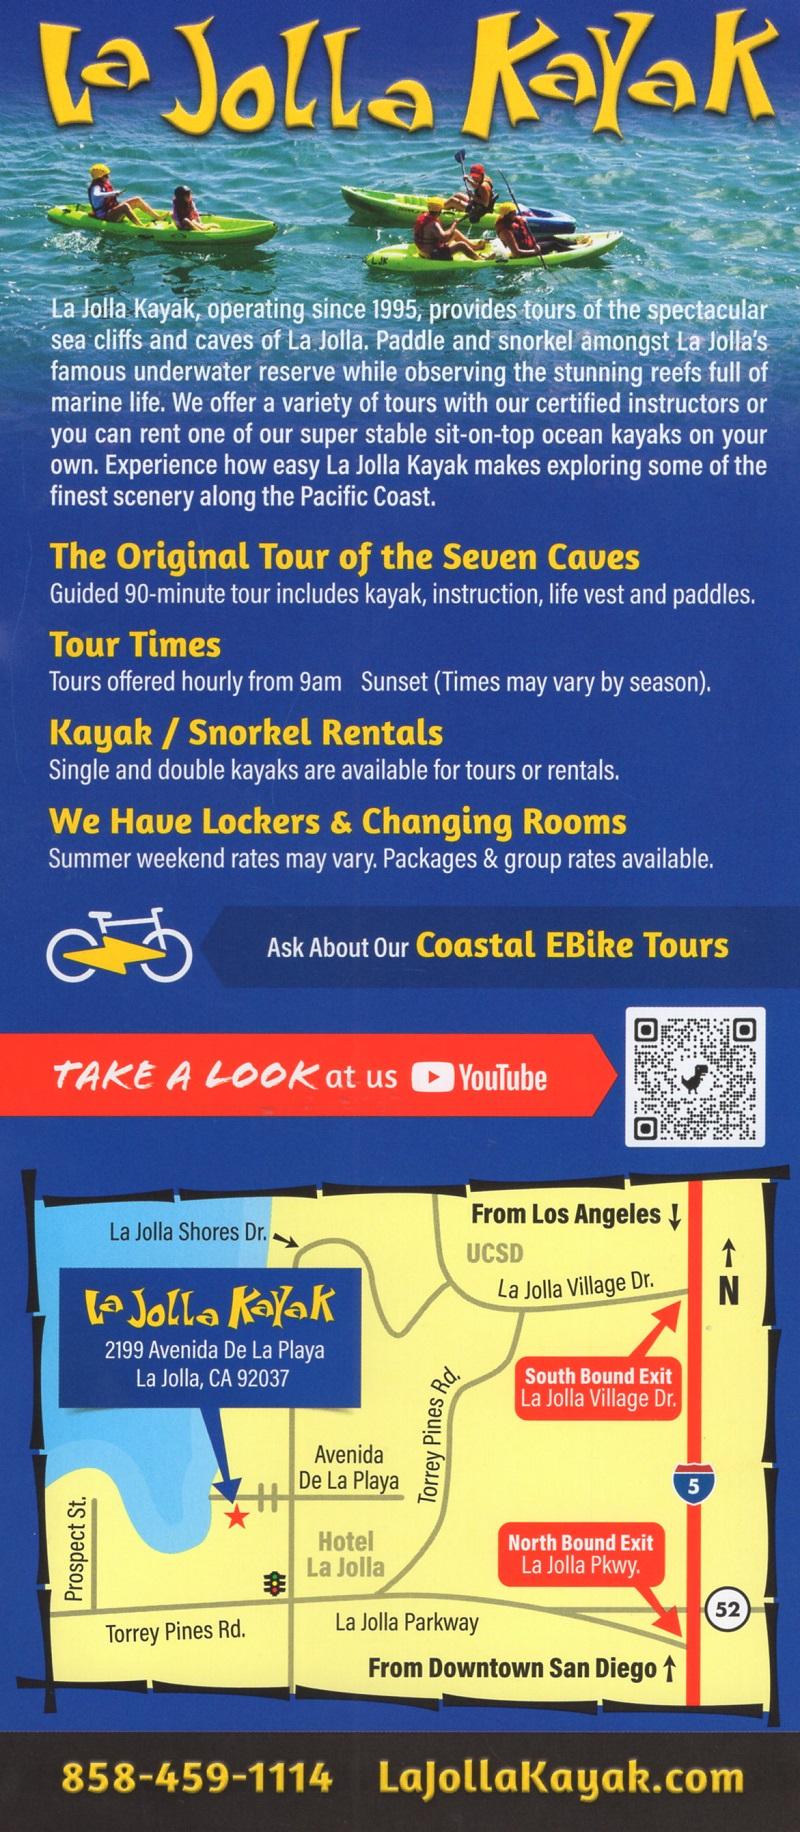 La Jolla Kayak brochure thumbnail